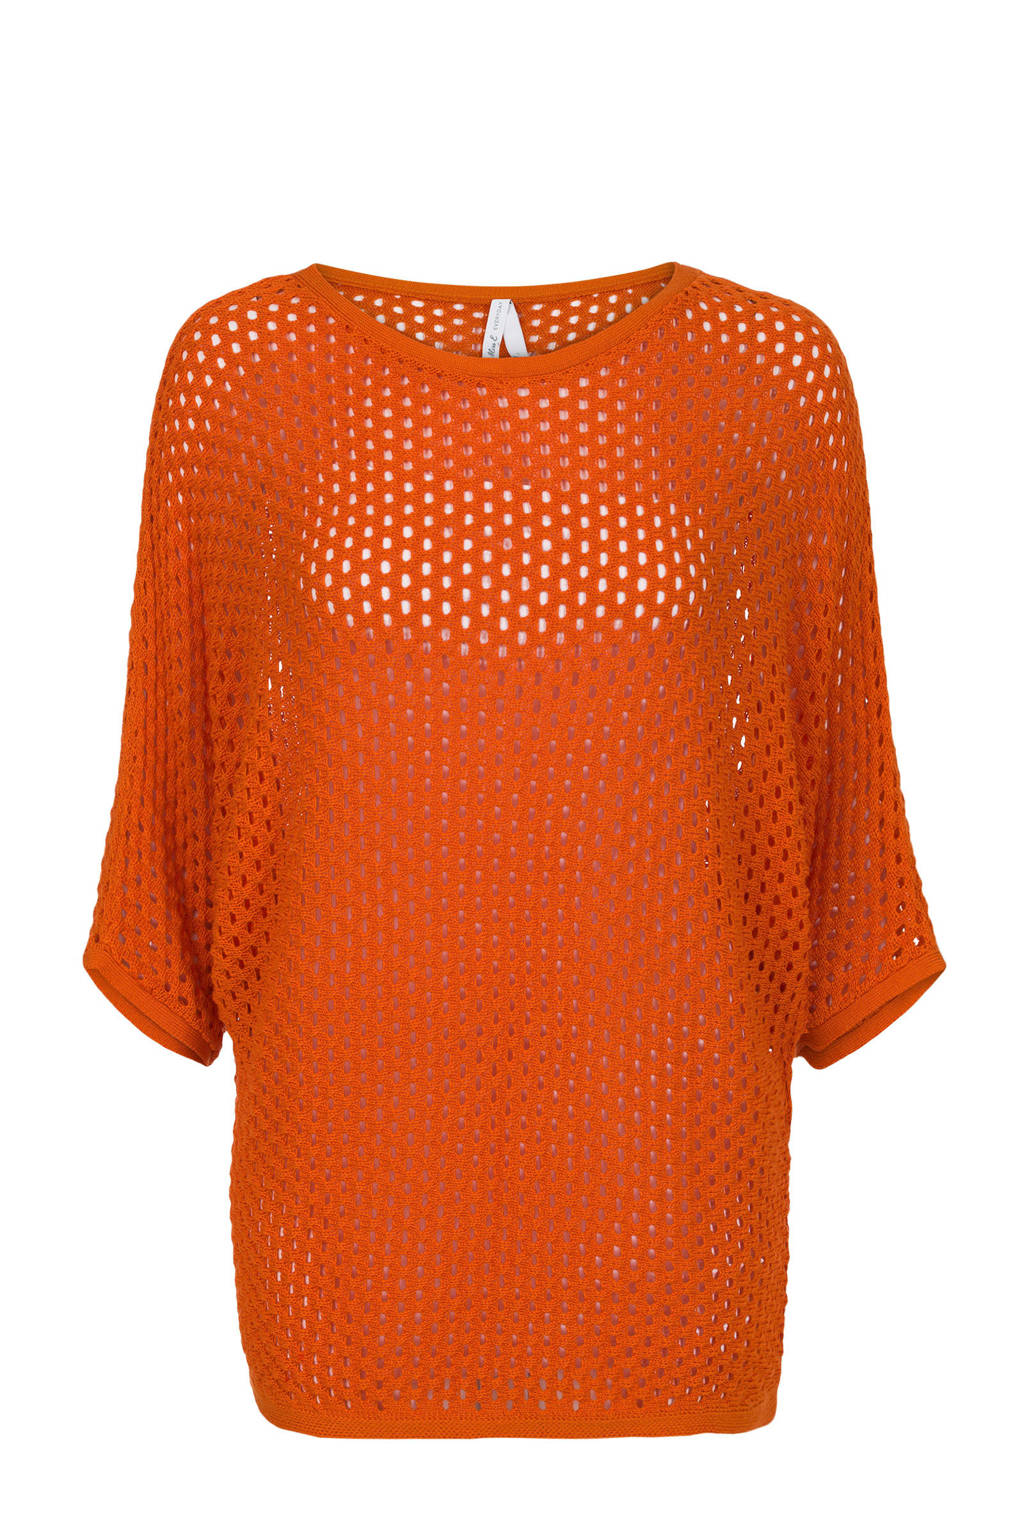 Miss Etam Regulier trui oranje, Oranje